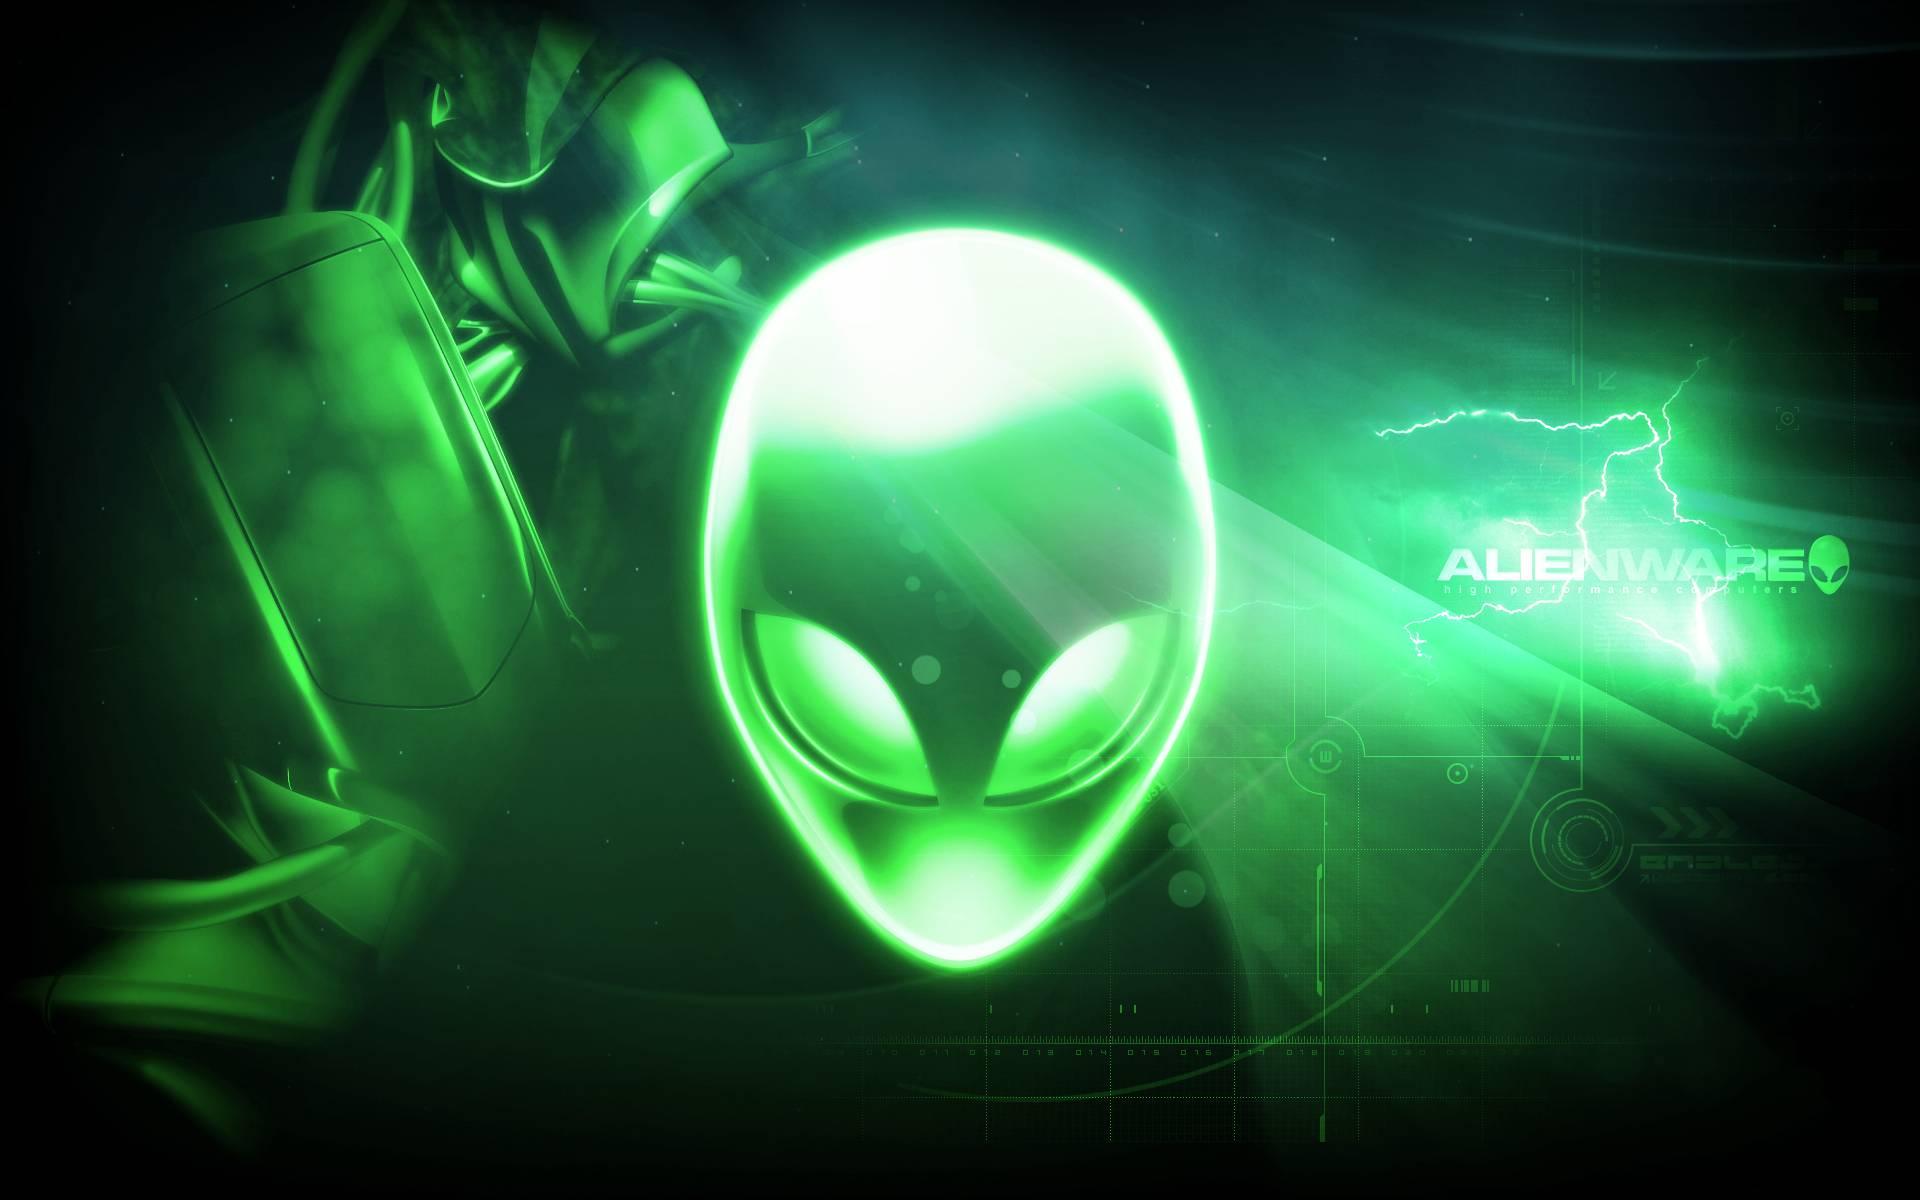 alienware wallpaper green hd - photo #15